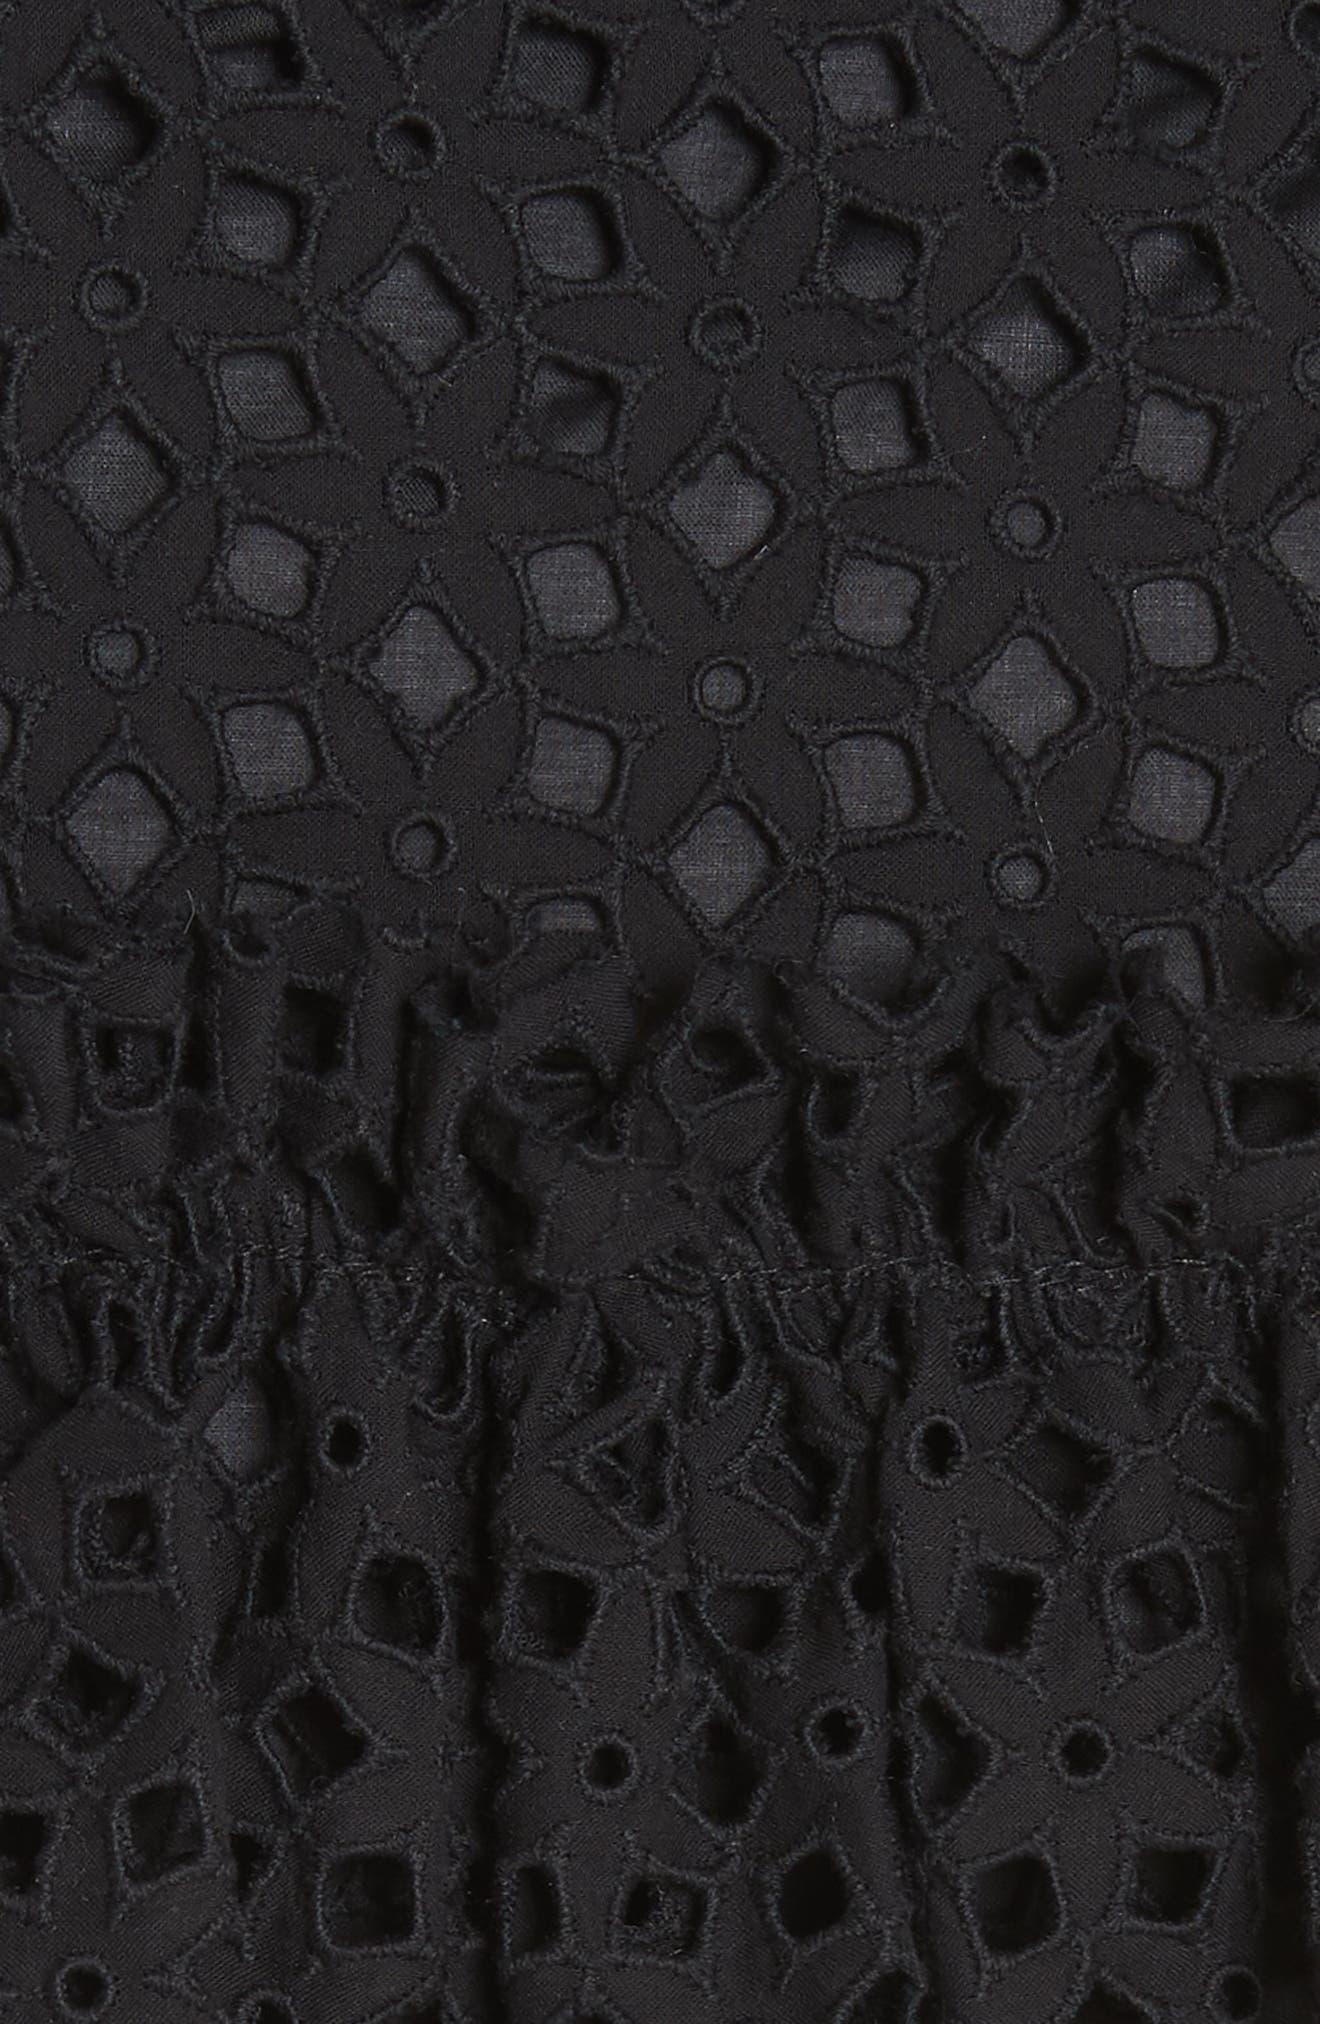 Floral Ruffle Tiered Cotton Eyelet Miniskirt,                             Alternate thumbnail 5, color,                             Black